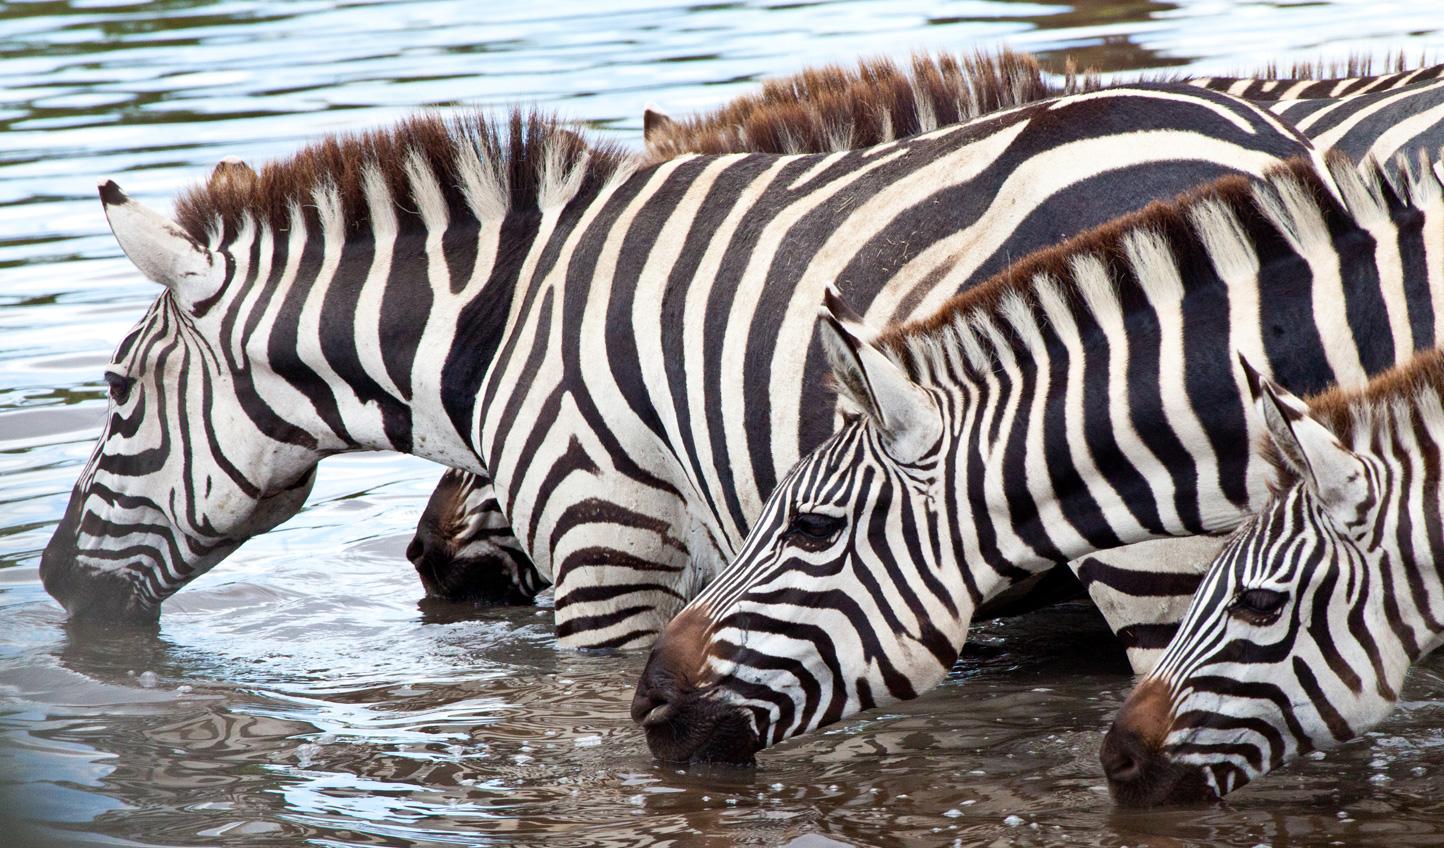 Watering holes act as virtually guaranteed wildlife-spotting spots